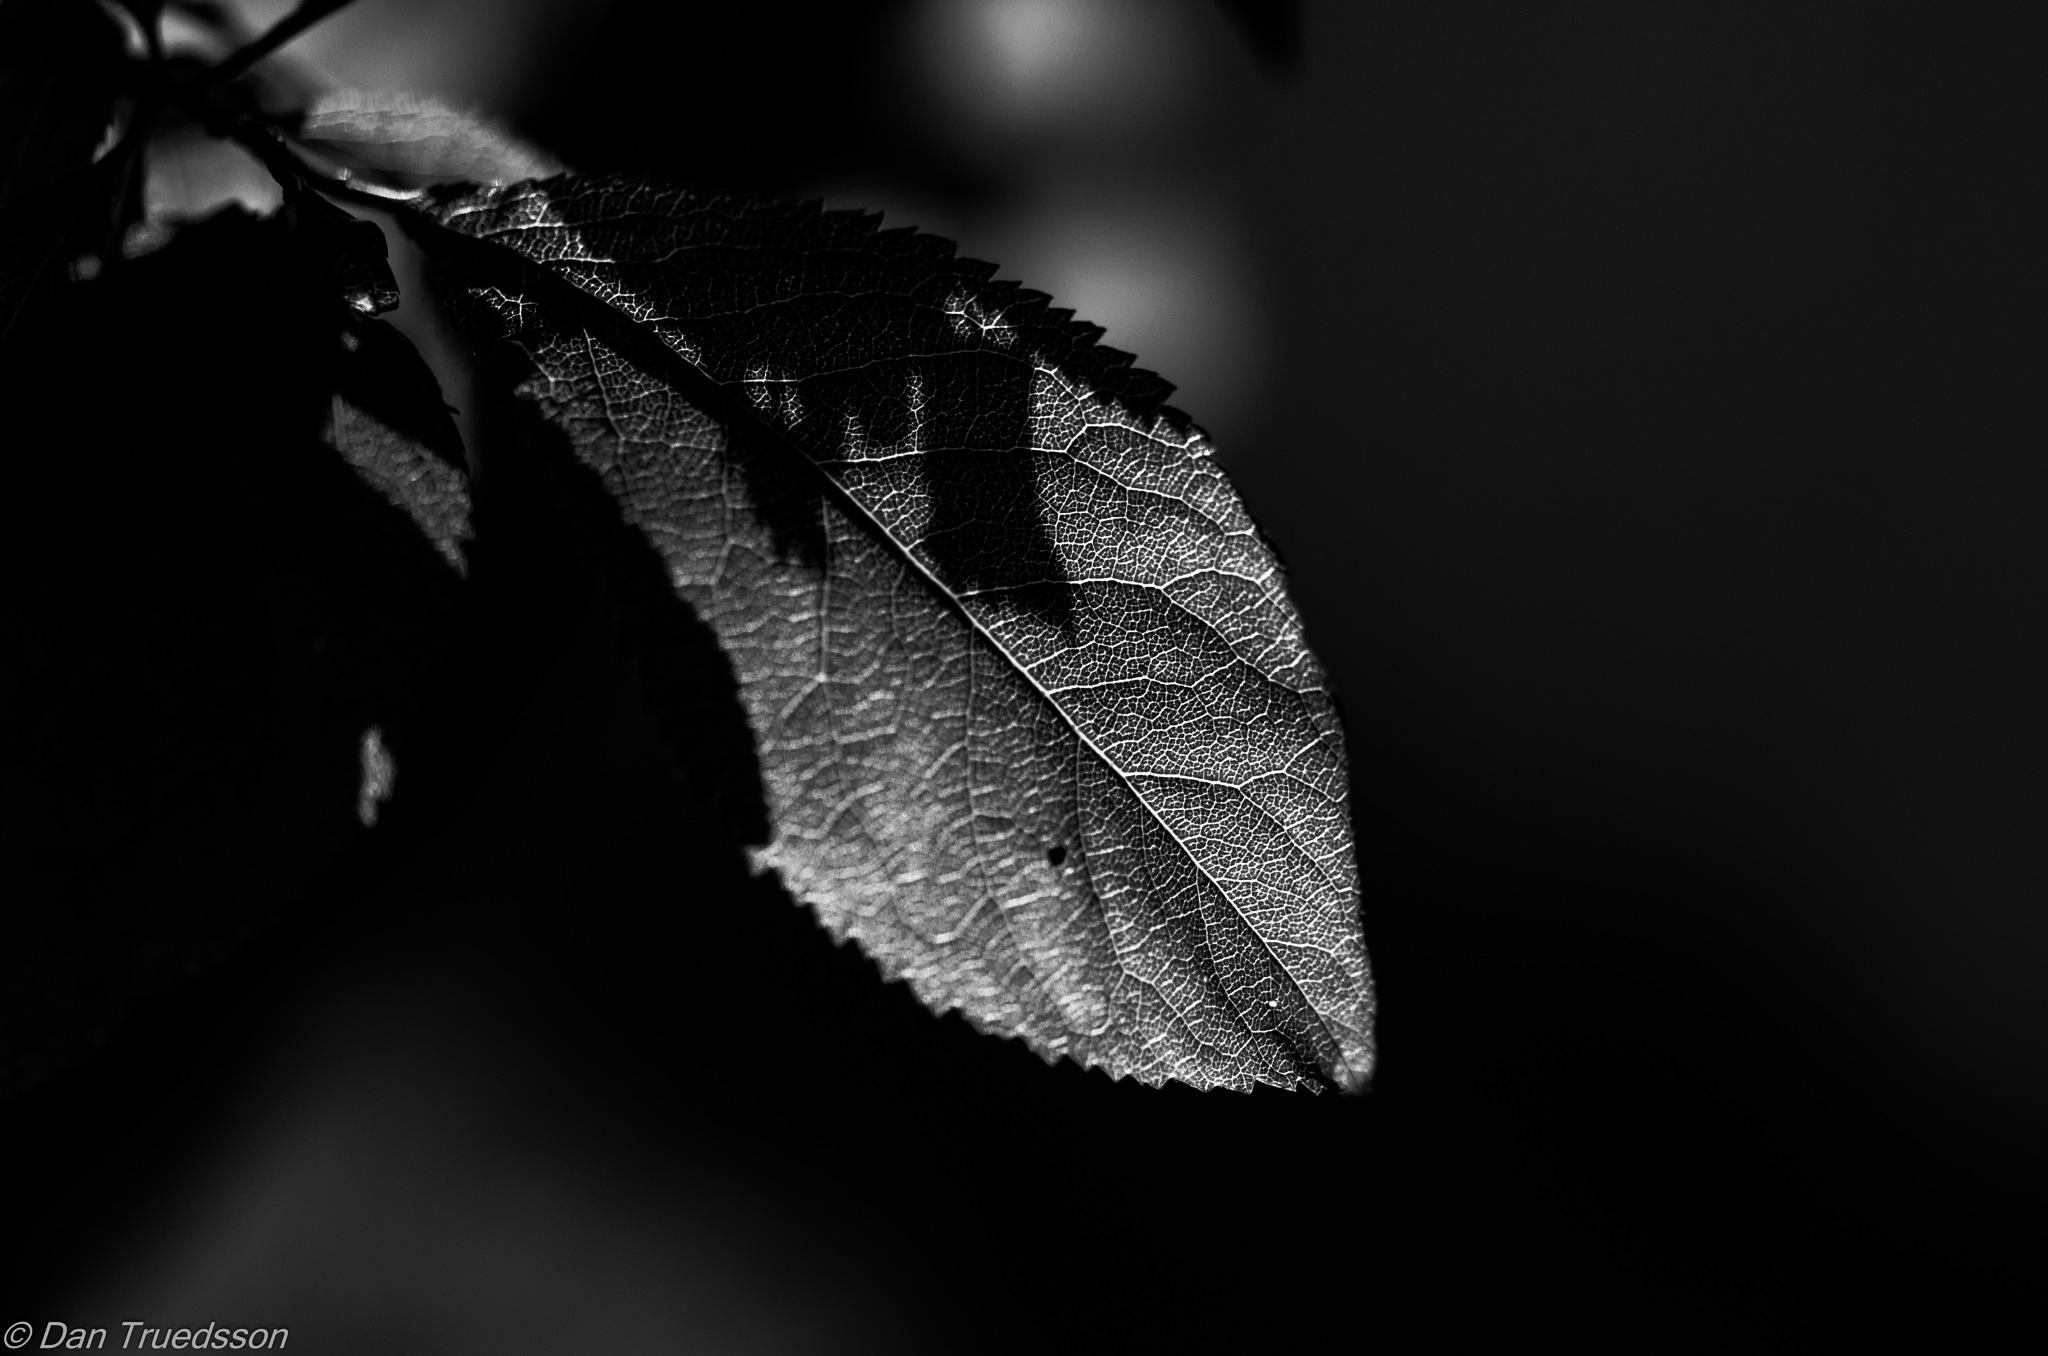 Leaves in backlight by Dan Truedsson